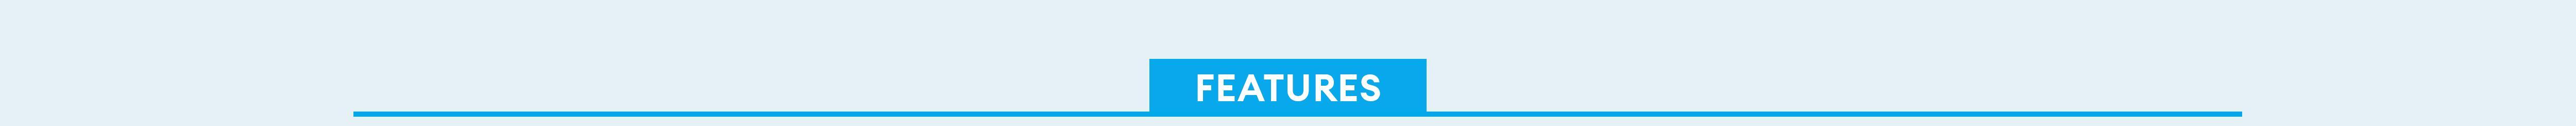 _features-next-billion